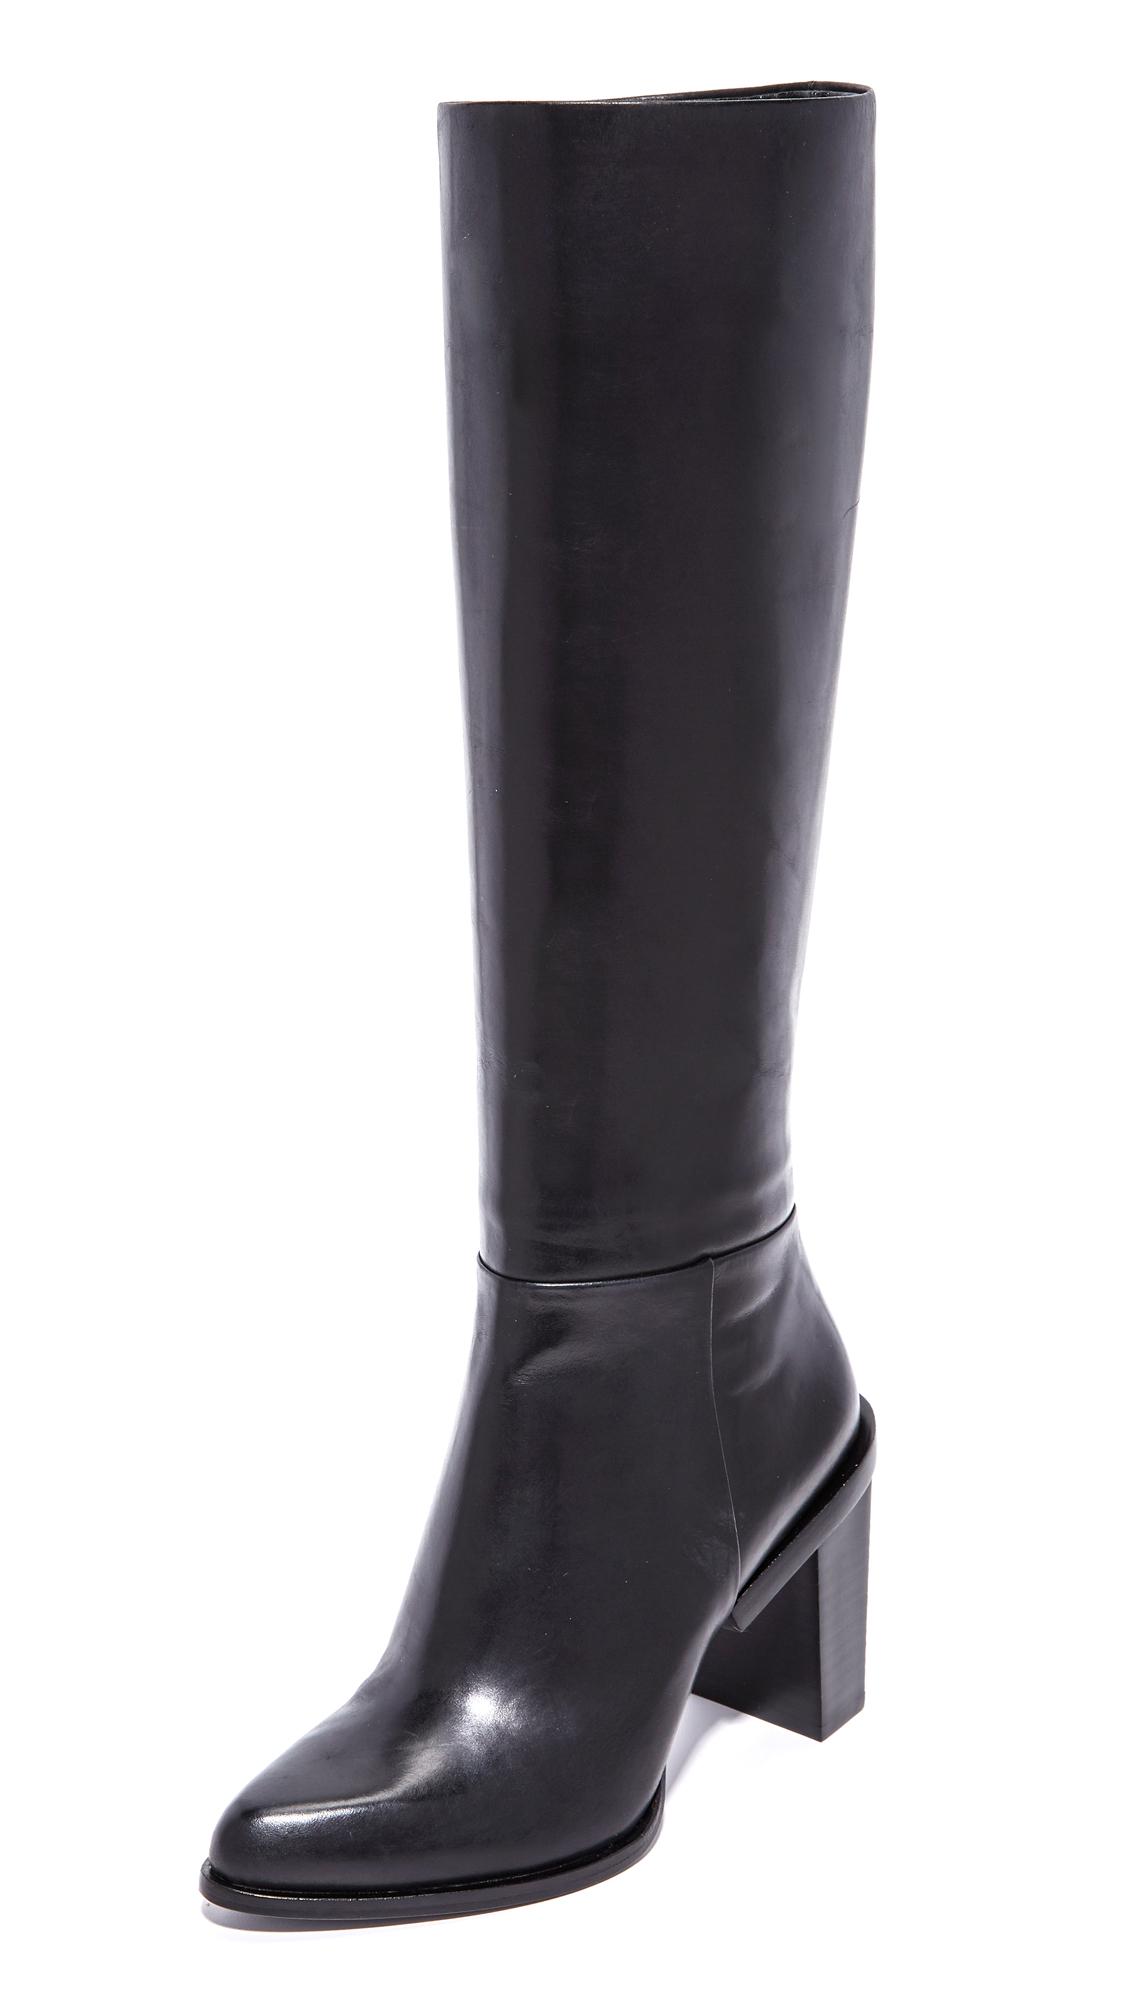 Dkny Pilar Knee High Pointy Boots - Black at Shopbop